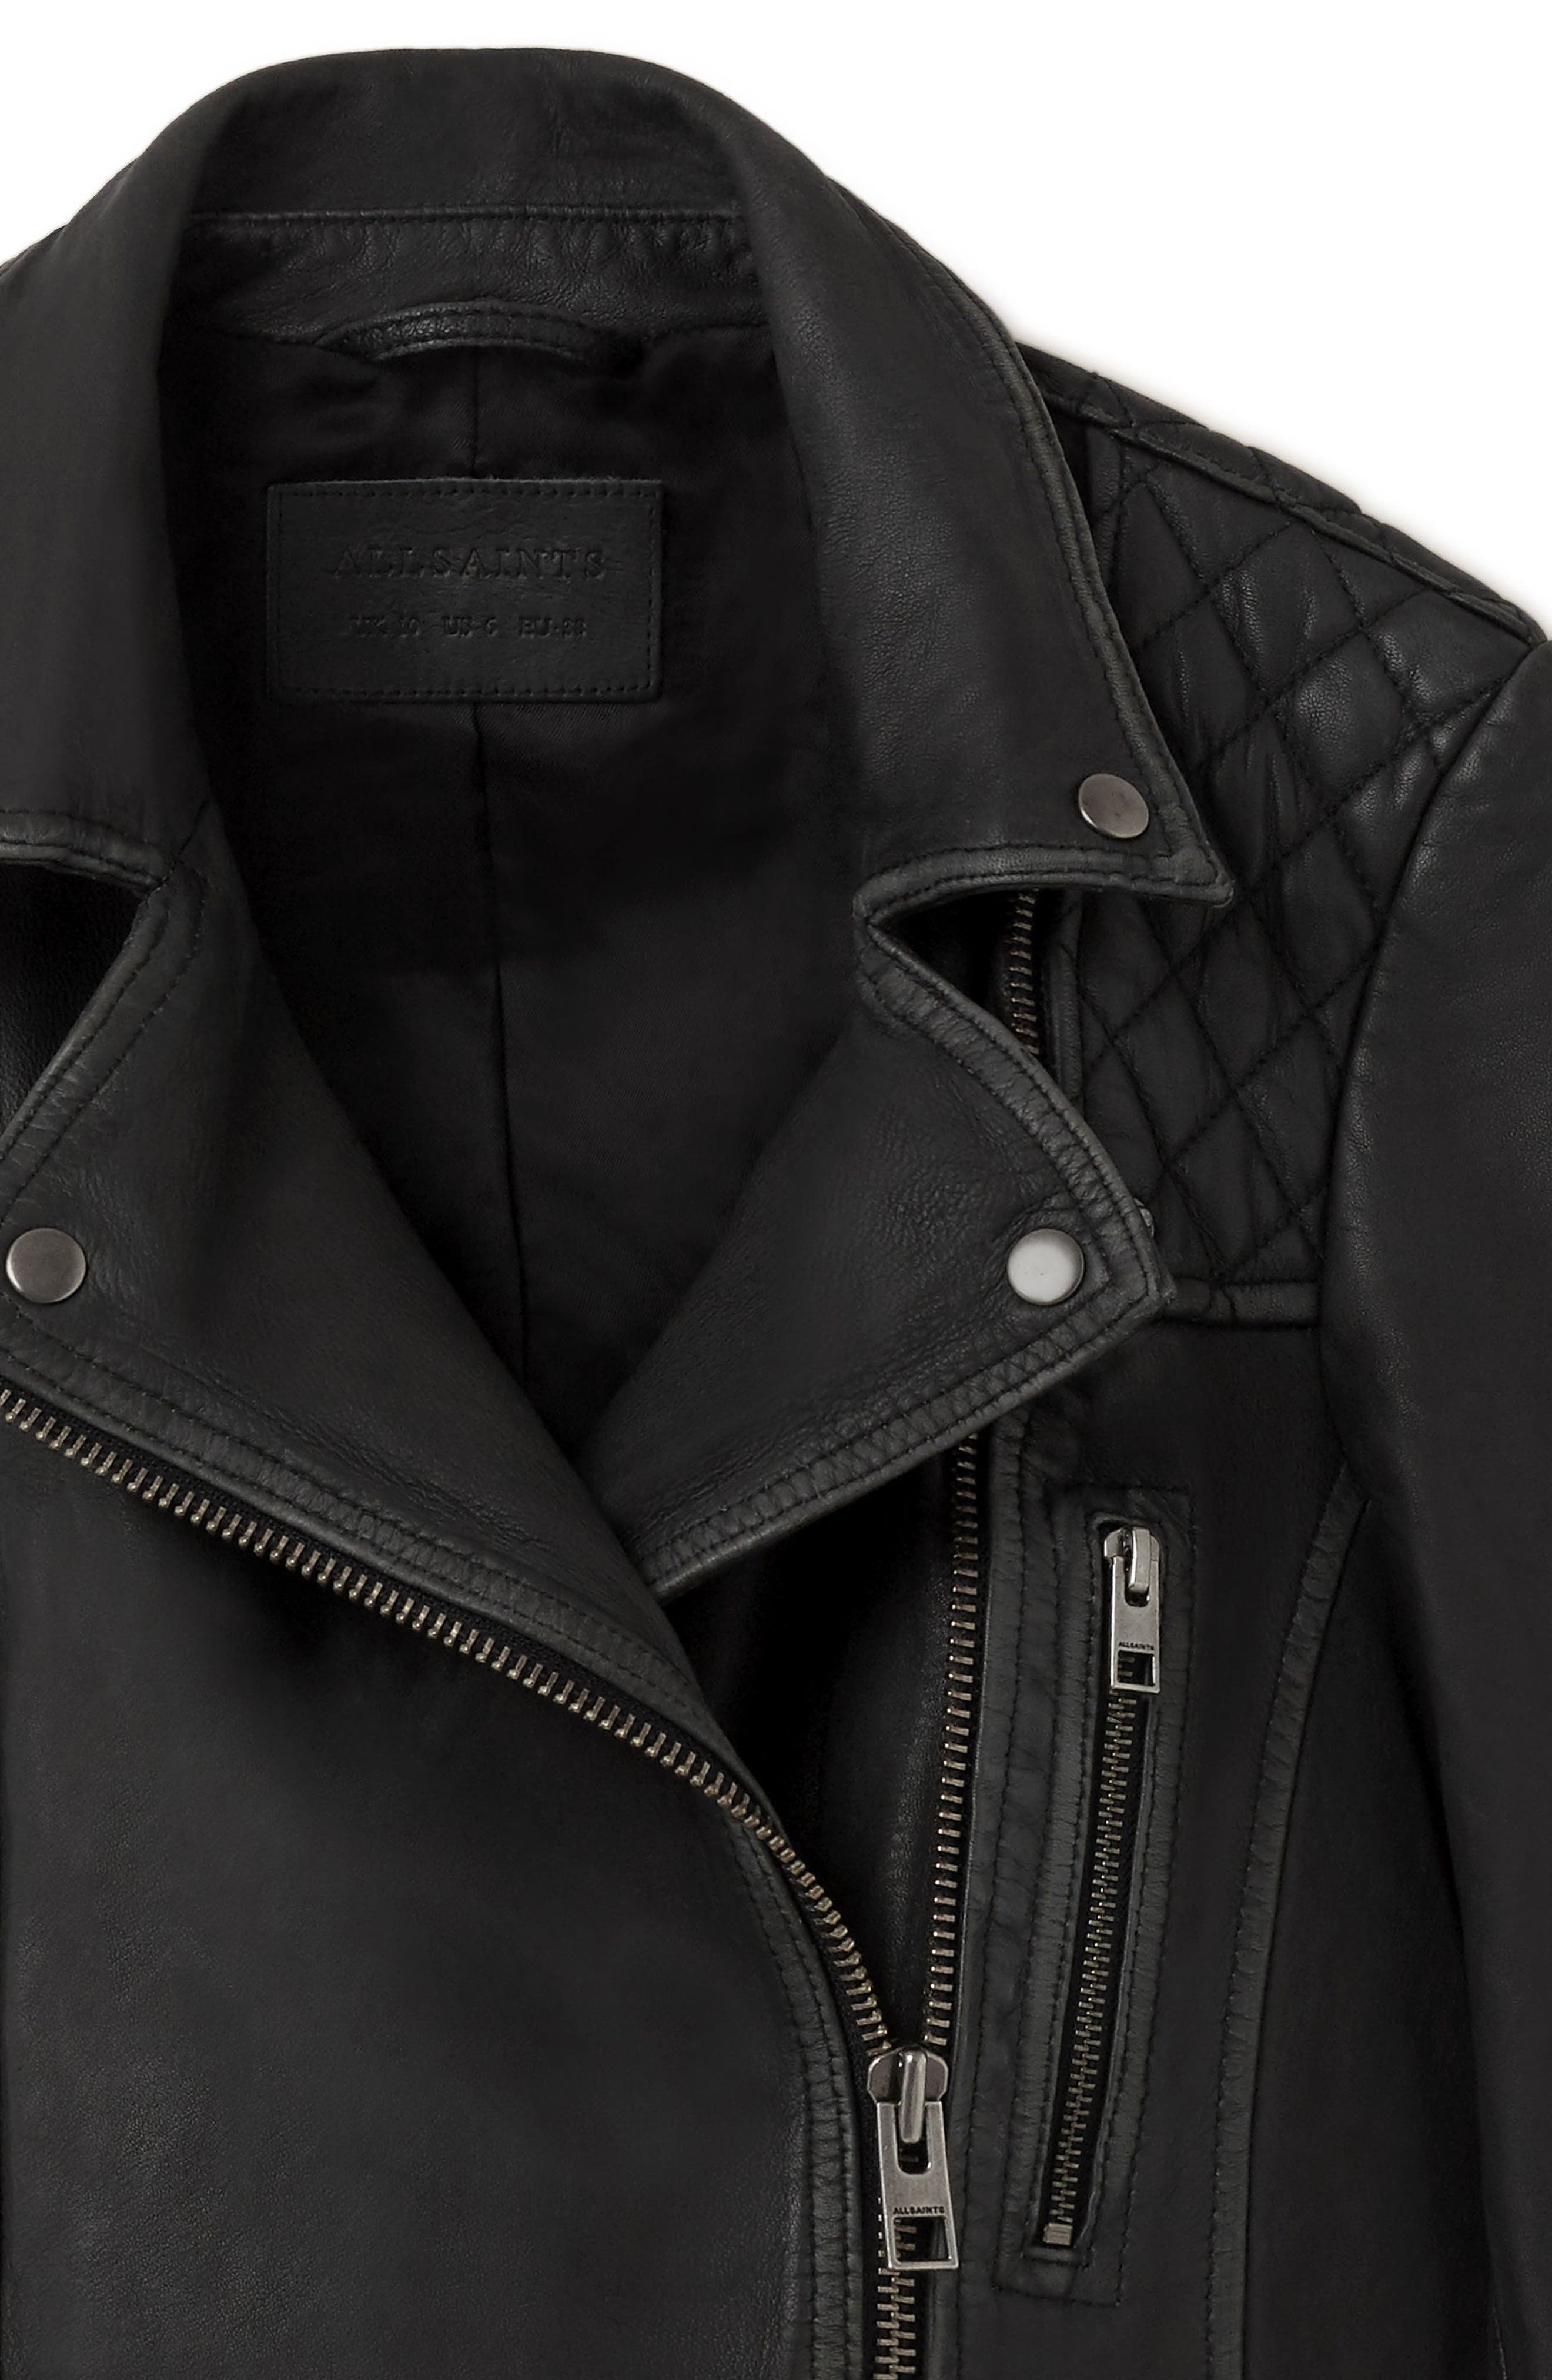 Cargo Leather Biker Jacket,                             Alternate thumbnail 4, color,                             Black/ Grey